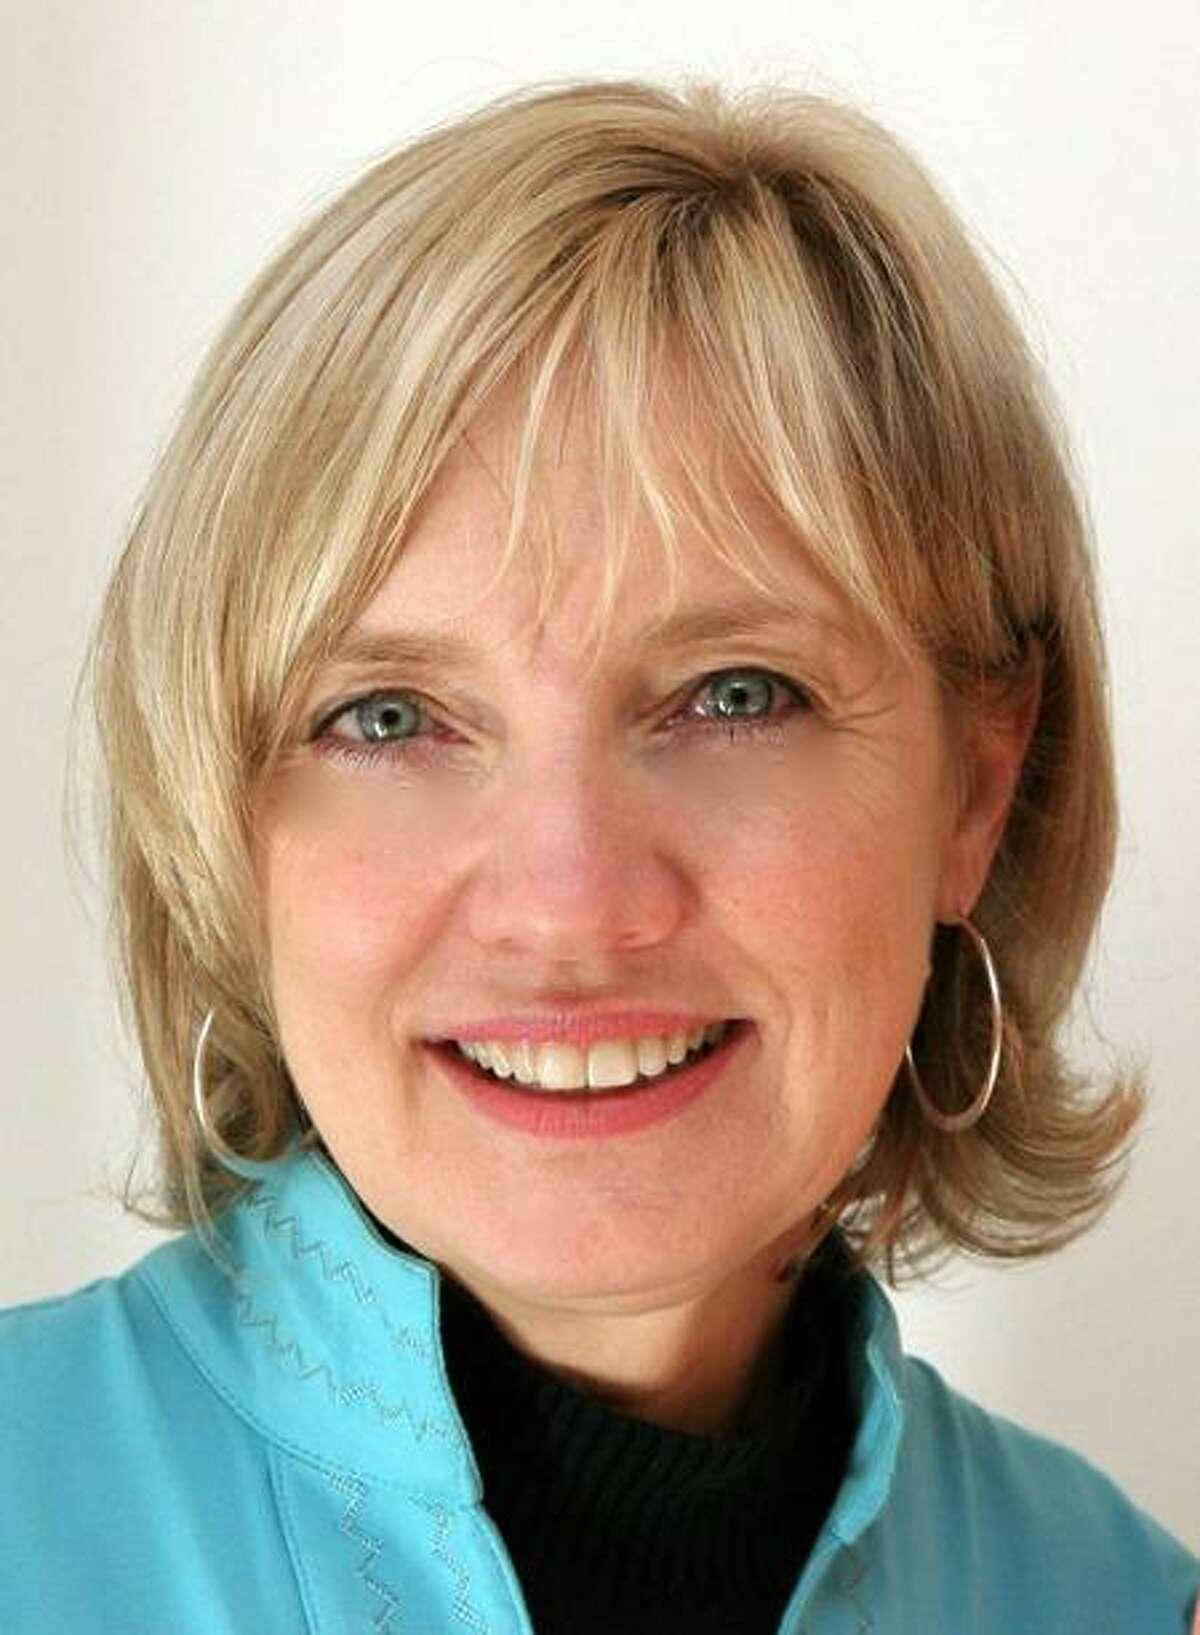 Judith Barbosa: Author Sandi Kahn Shelton